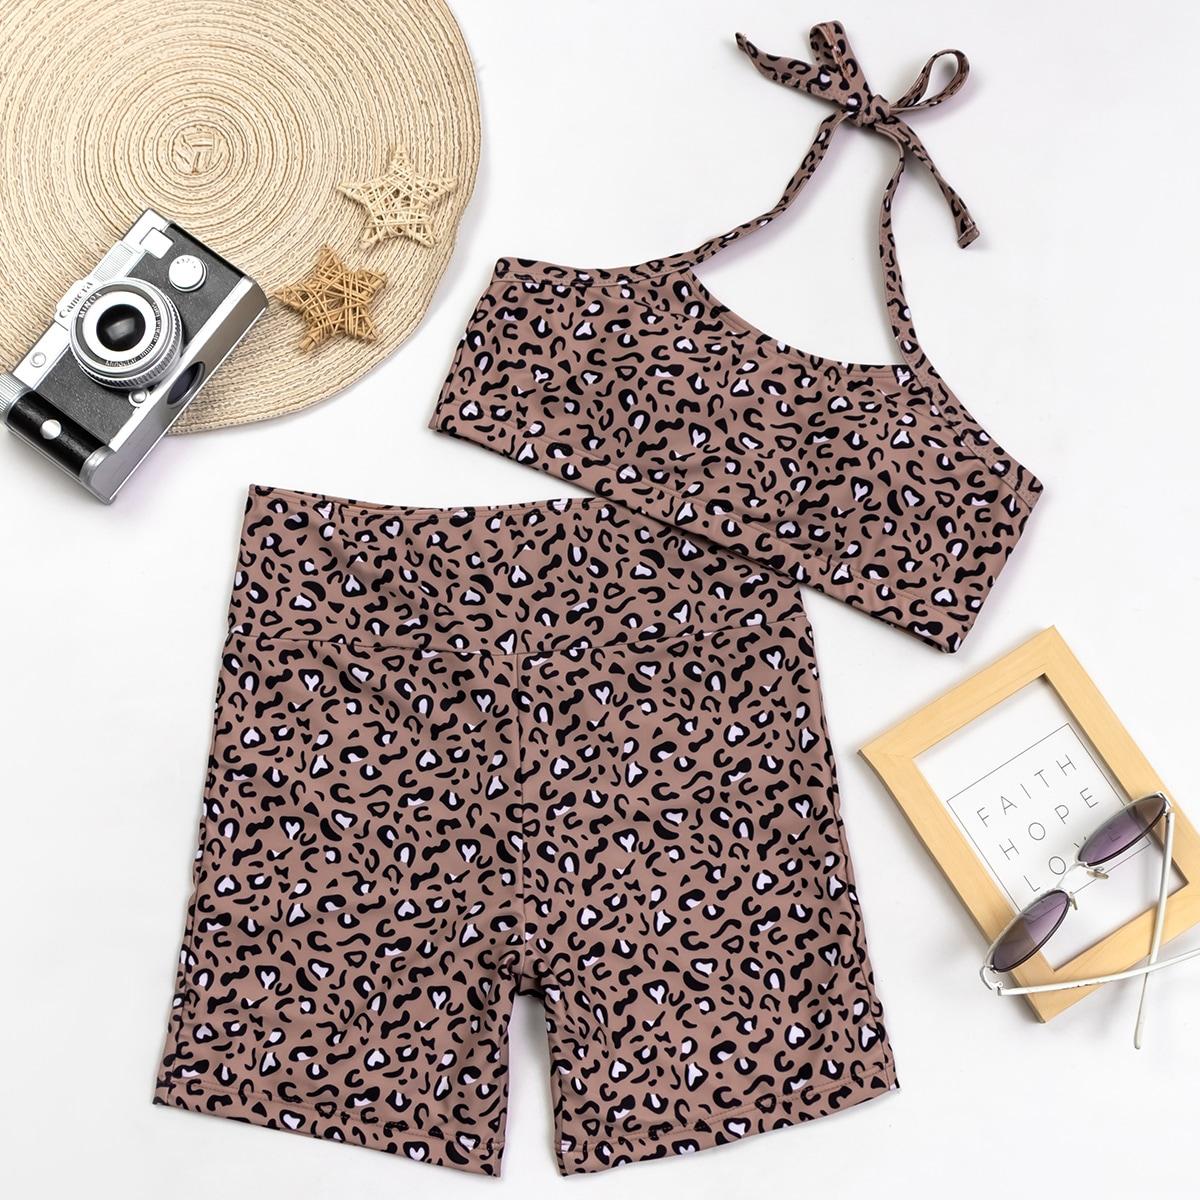 SHEIN / Allover Graphic Shorts Bikini Swimsuit